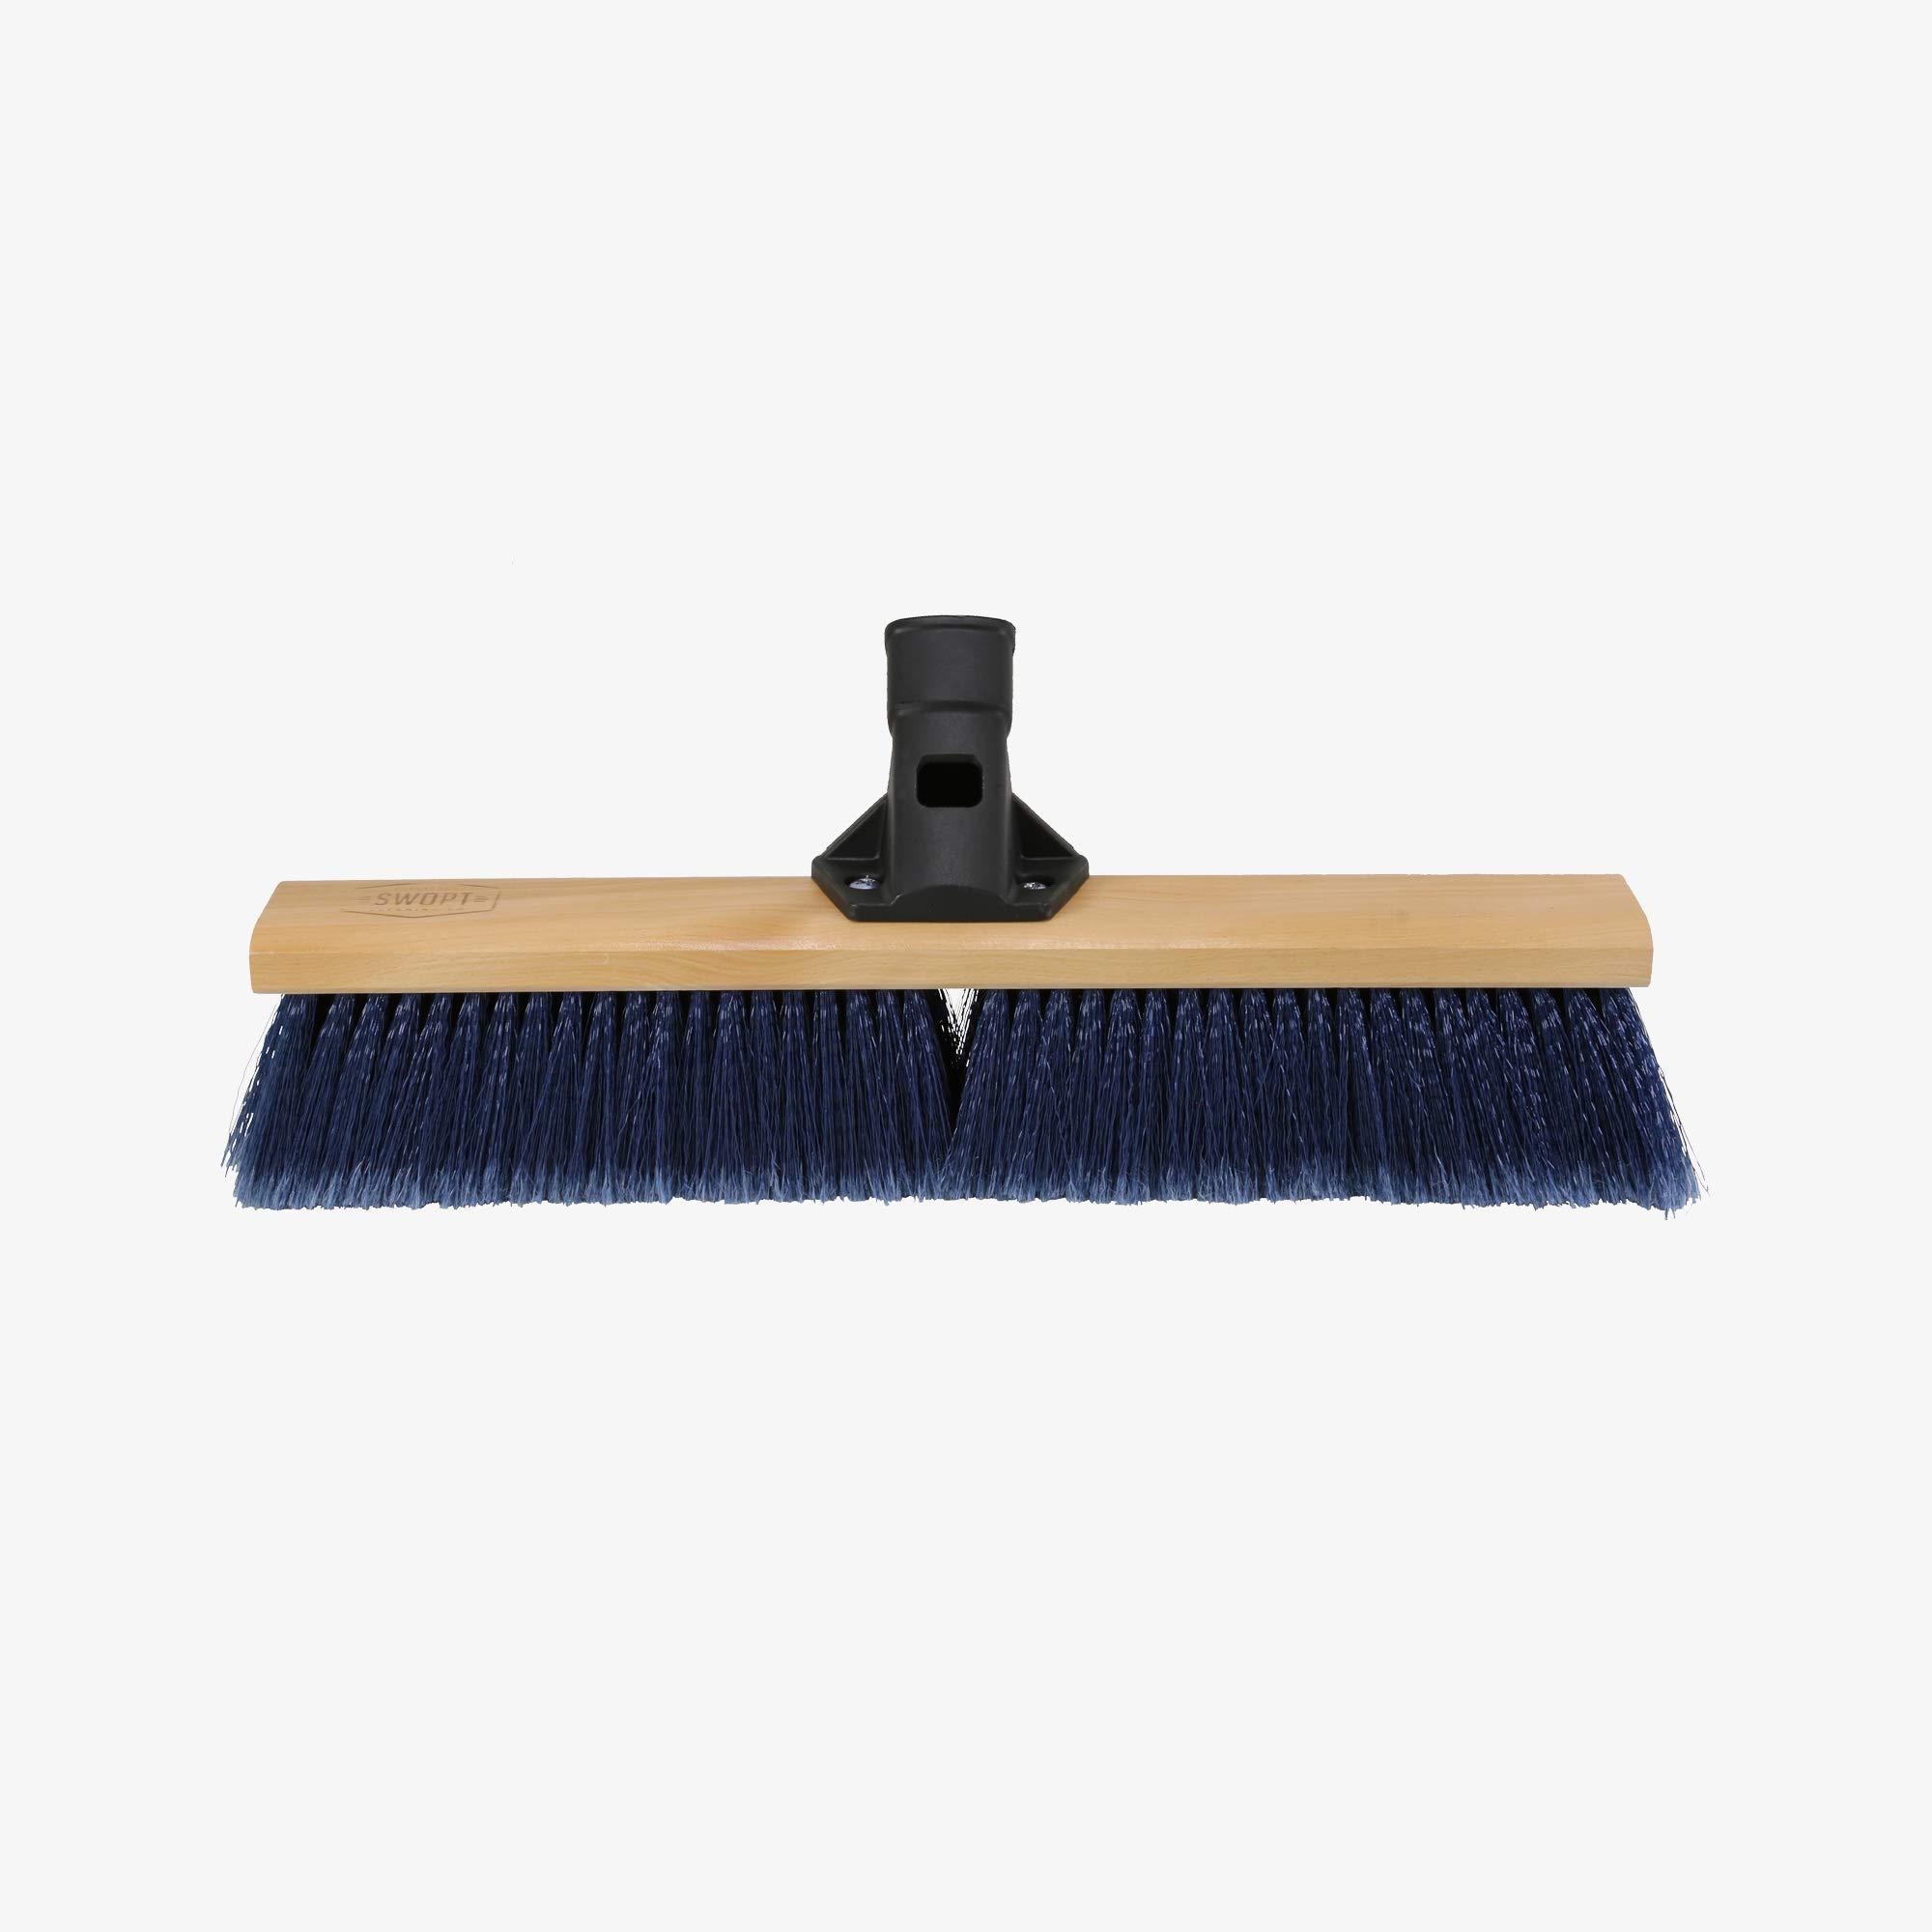 Swopt 5113C4 SWOPT 18 Premium Multi-Surface Push Broom Head, Push Broom for Indoor and Outdoor Use